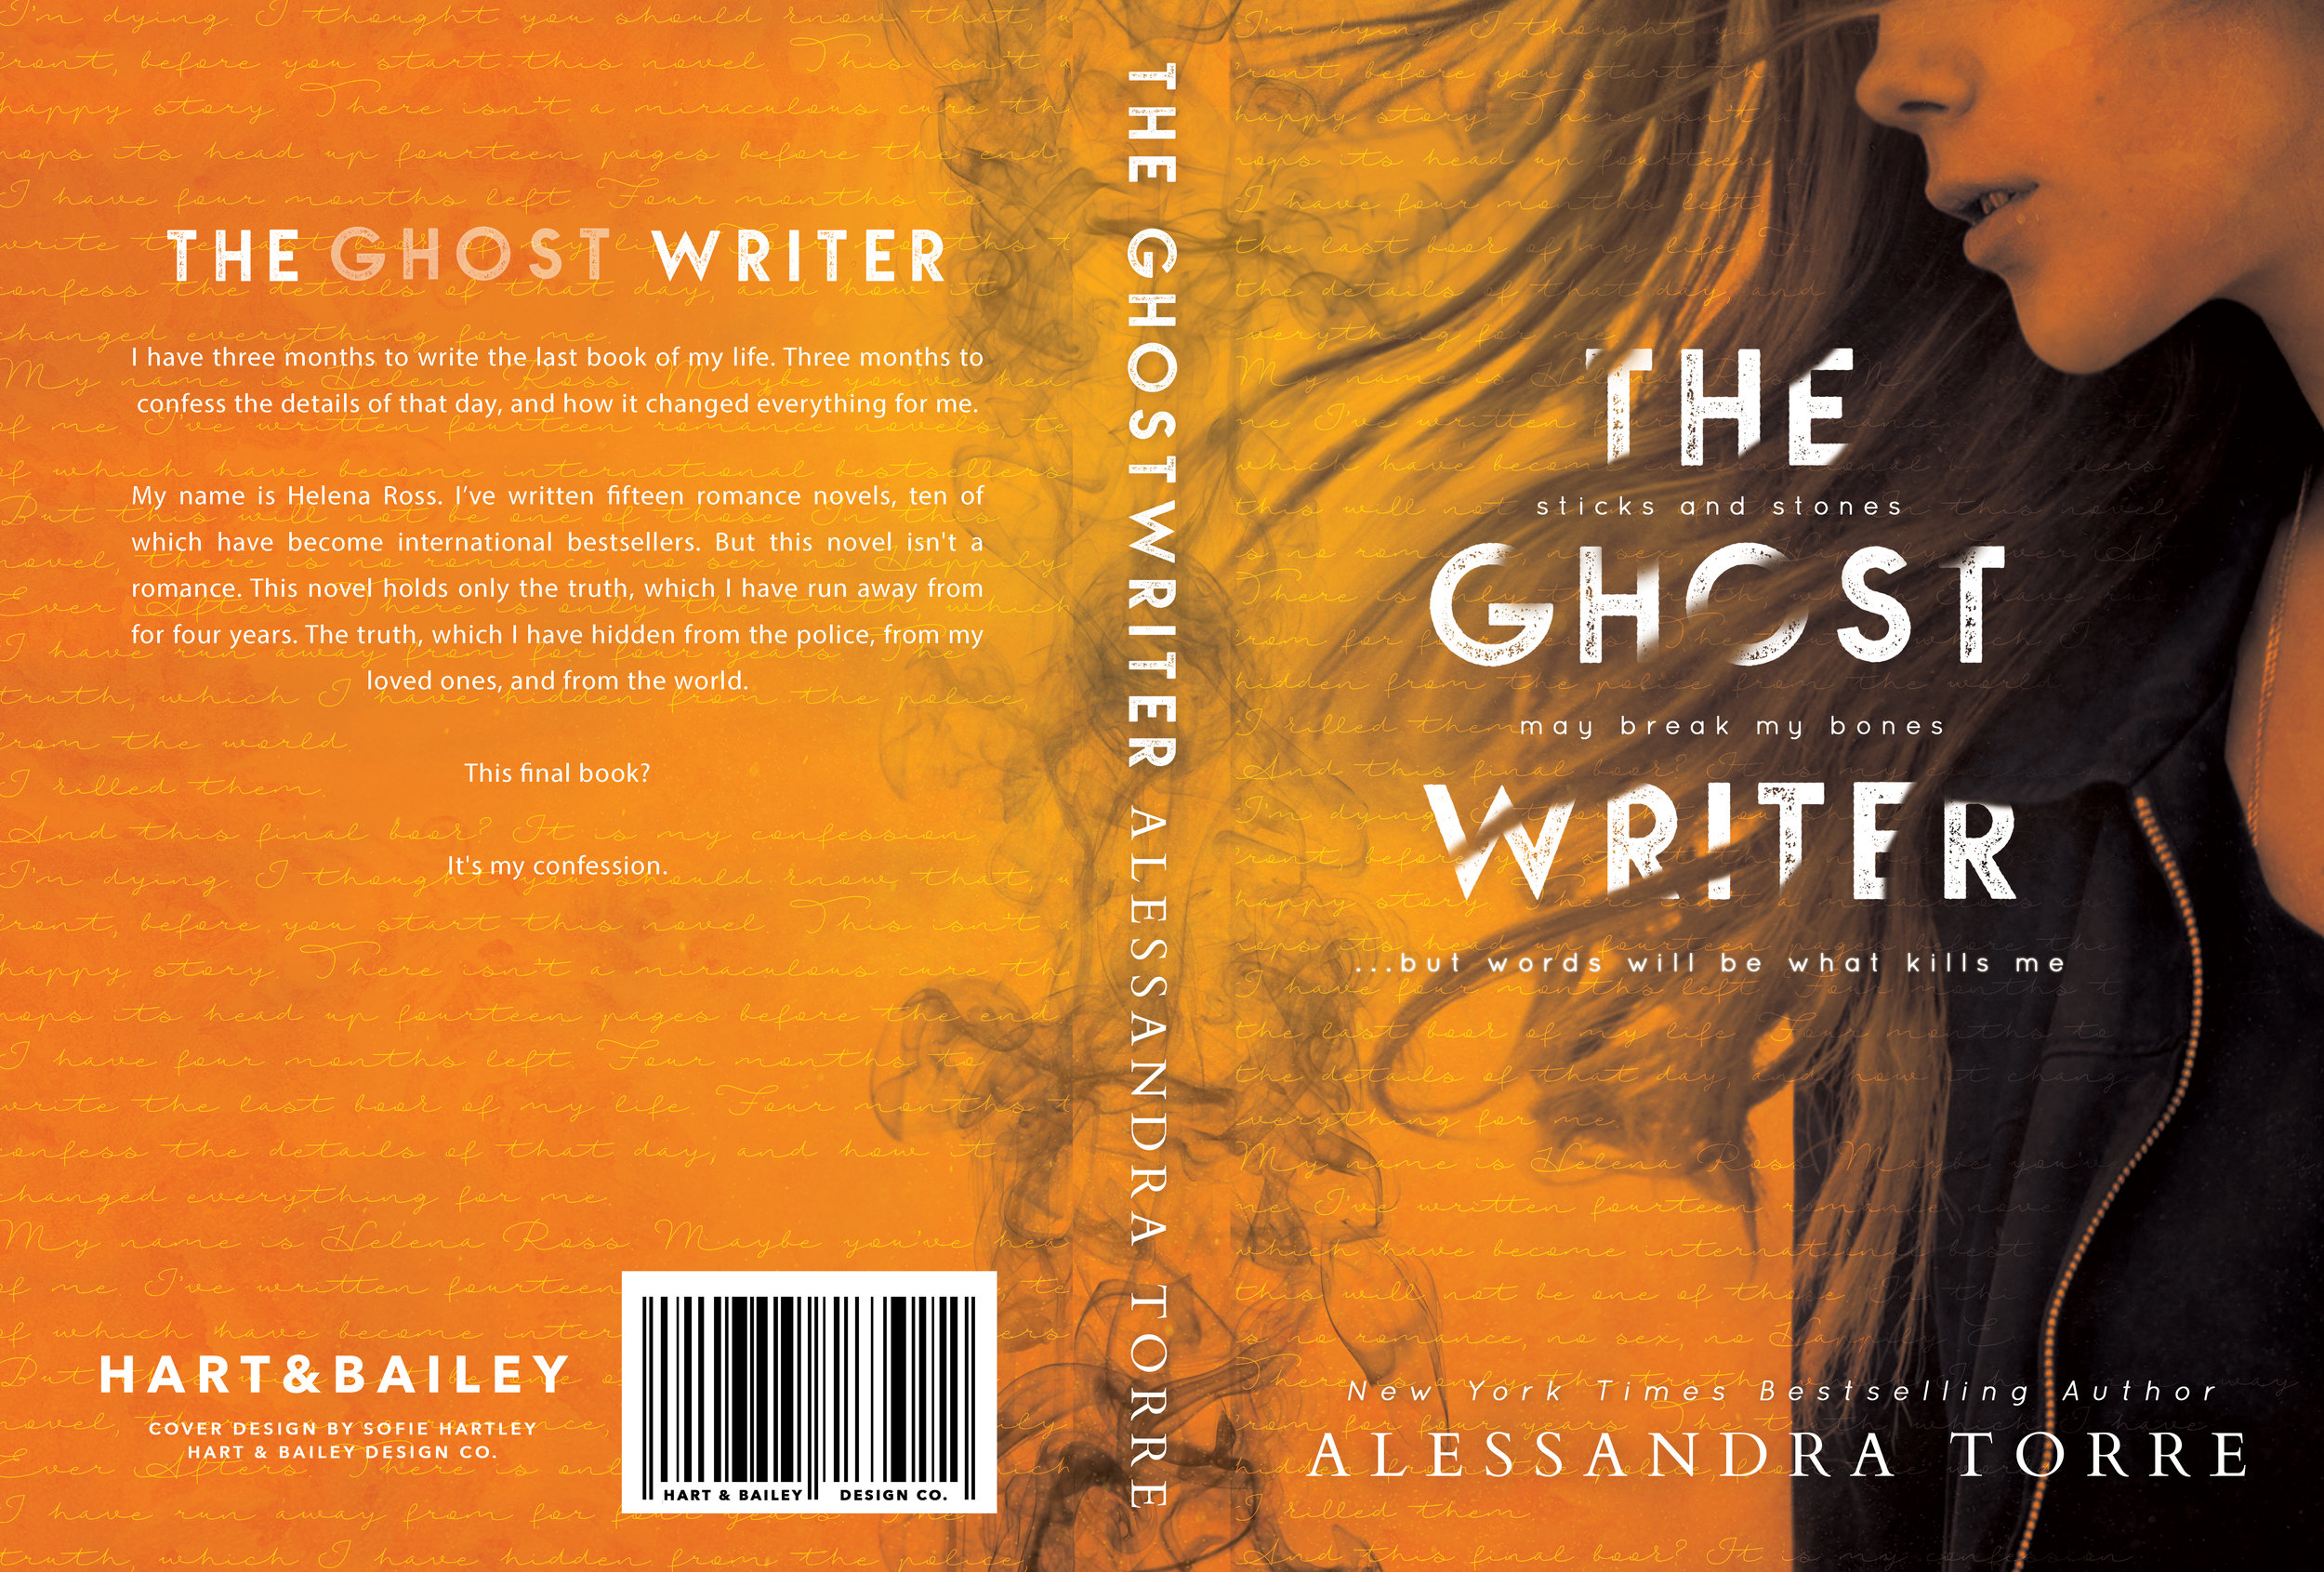 ghostwriter paperback spread